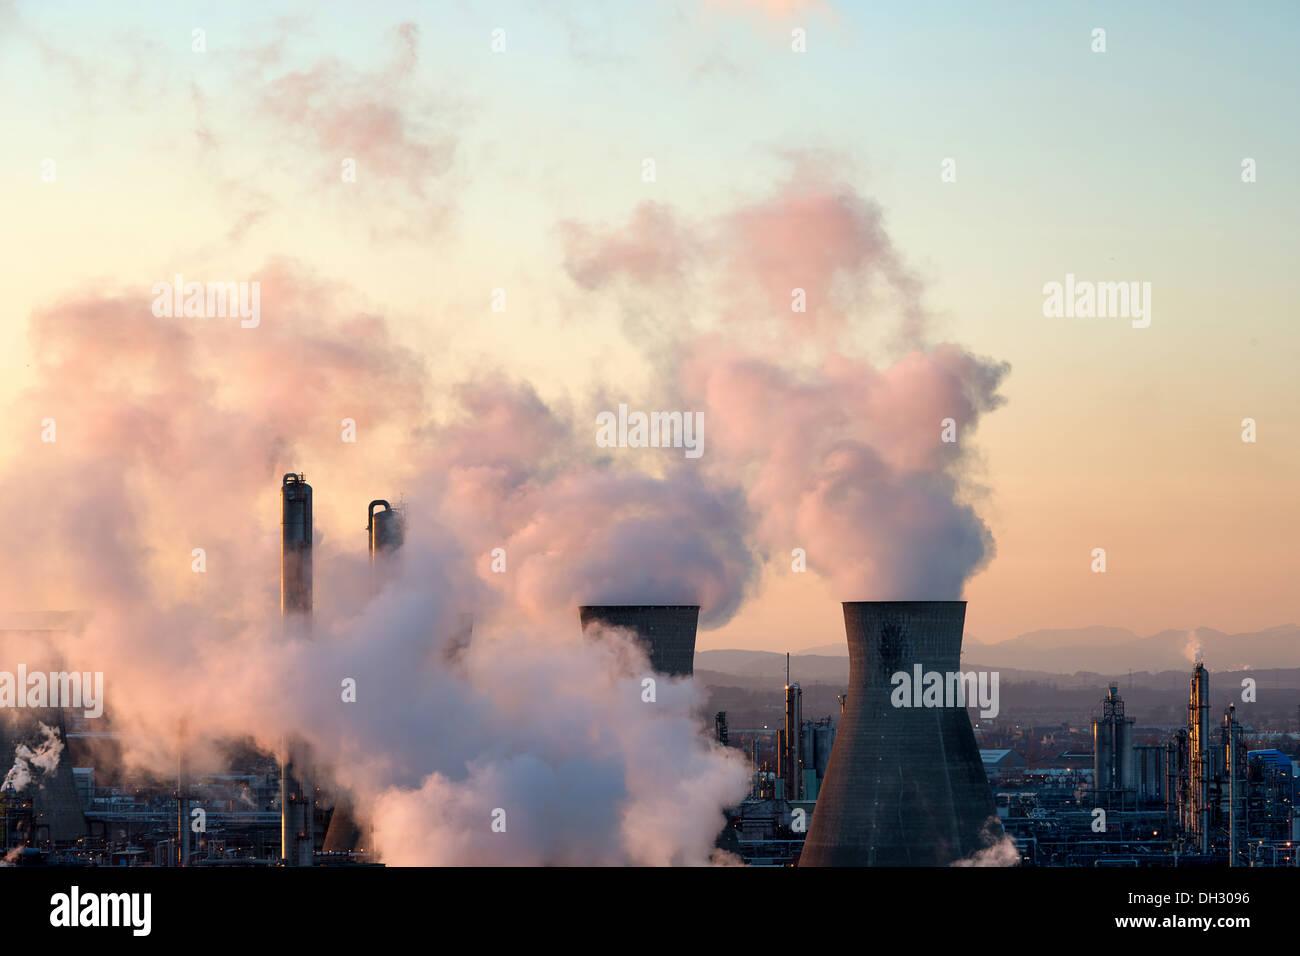 Grangemouth oil refinery chimneys spewing smoke in atmosphere, sunset coloring vapors in pink - Stock Image